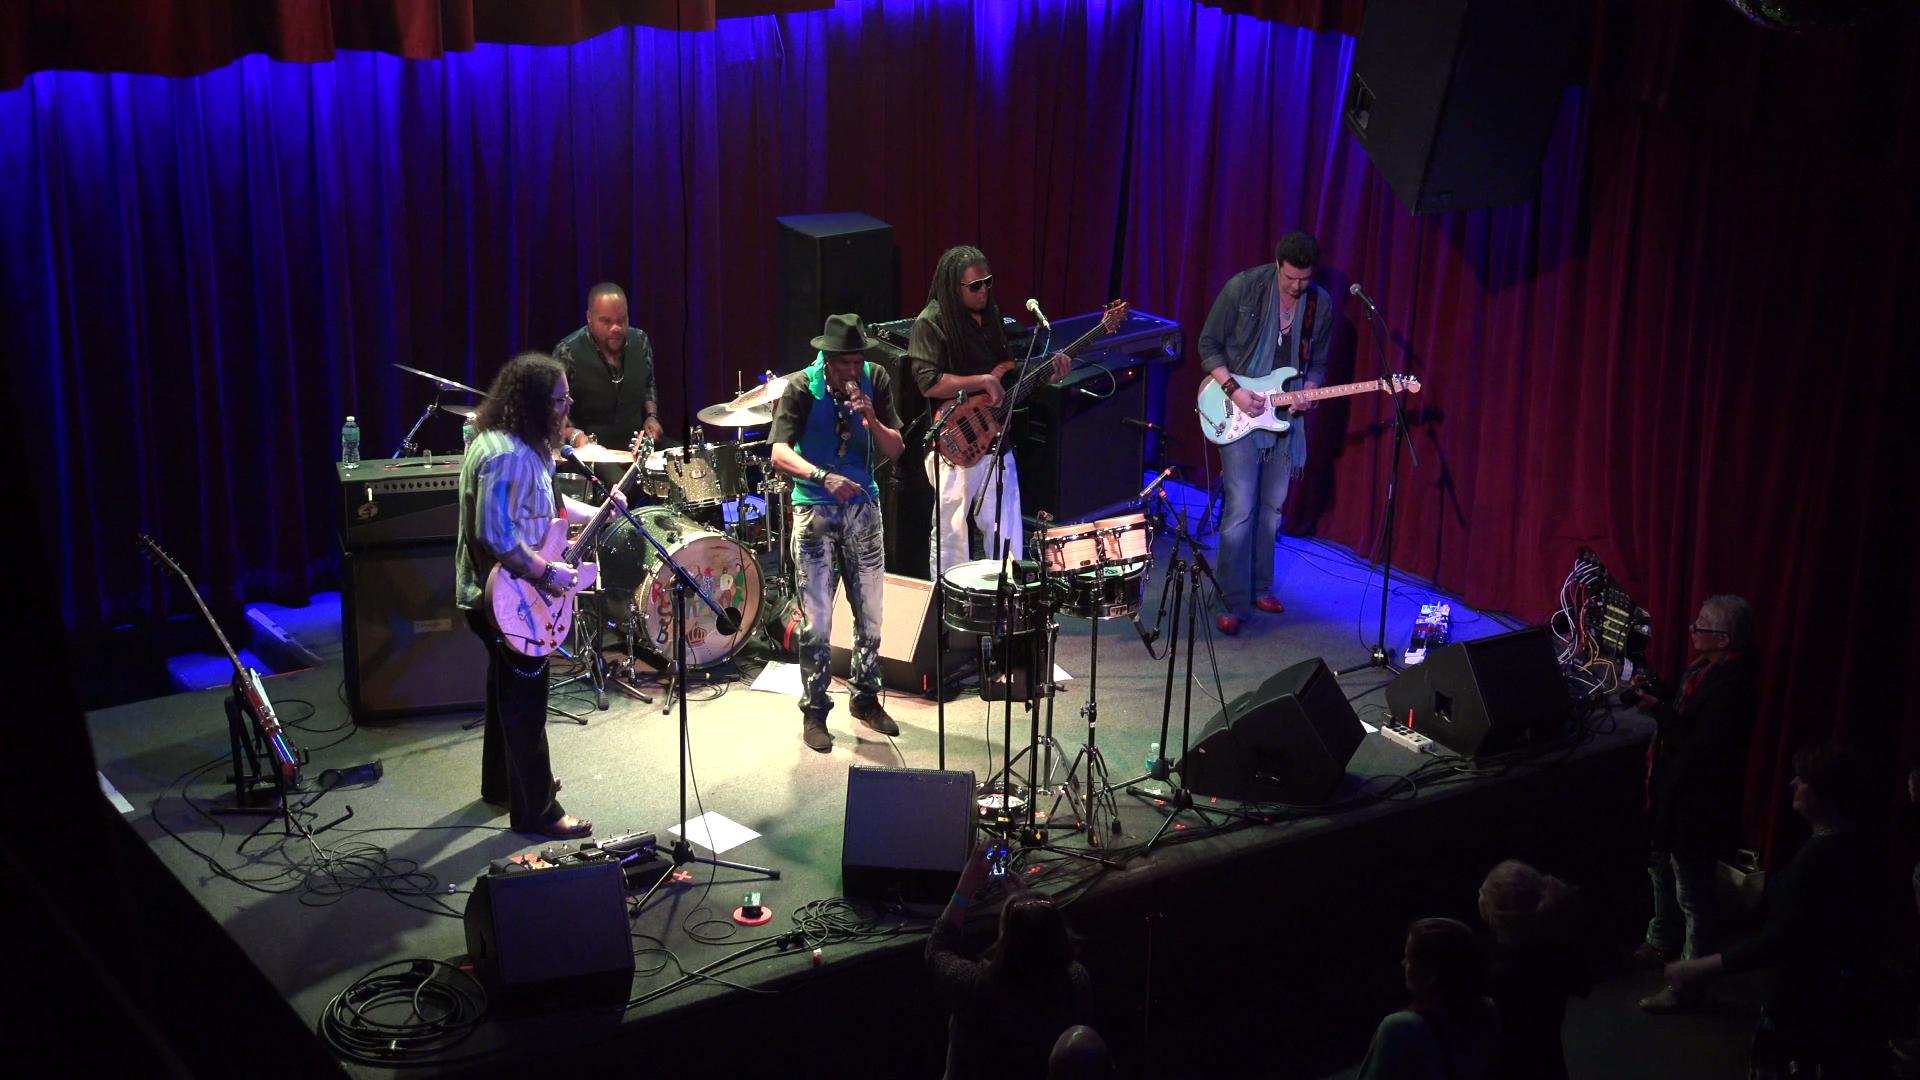 🎵 The Royal Southern Brotherhood | Live at Ardmore Music Hall